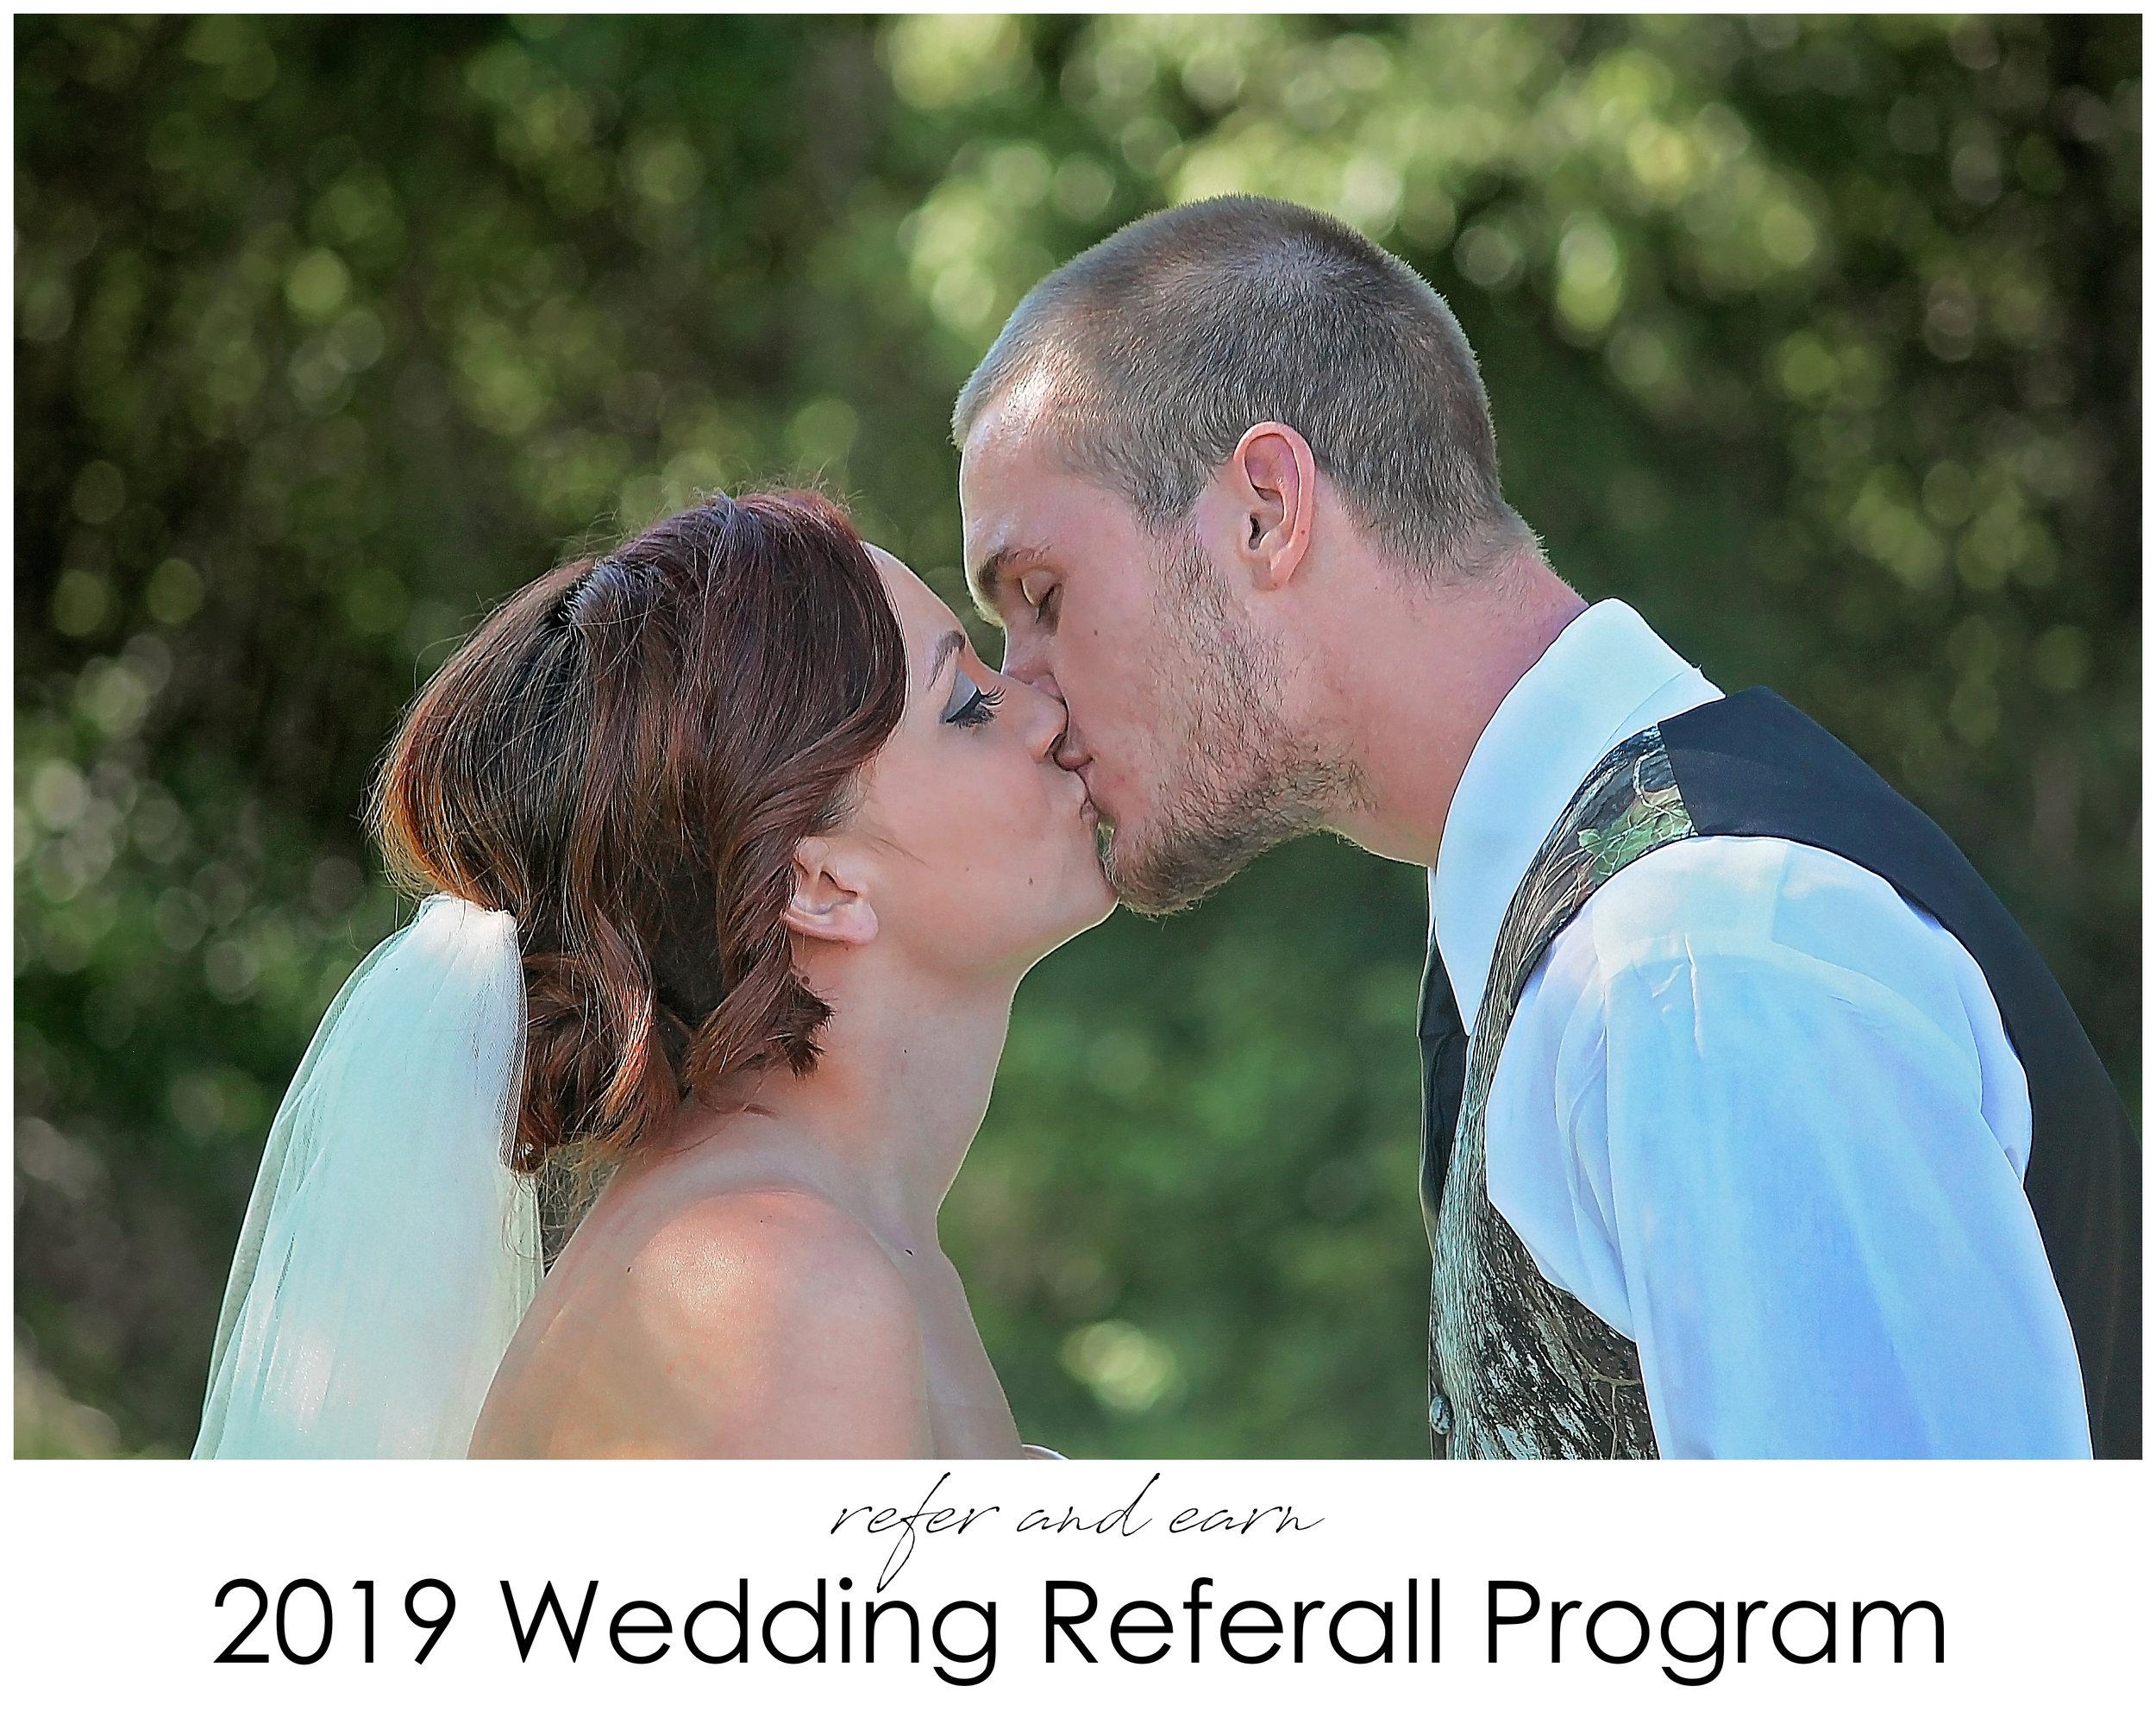 kansas-city-mo-wedding-referral.jpg